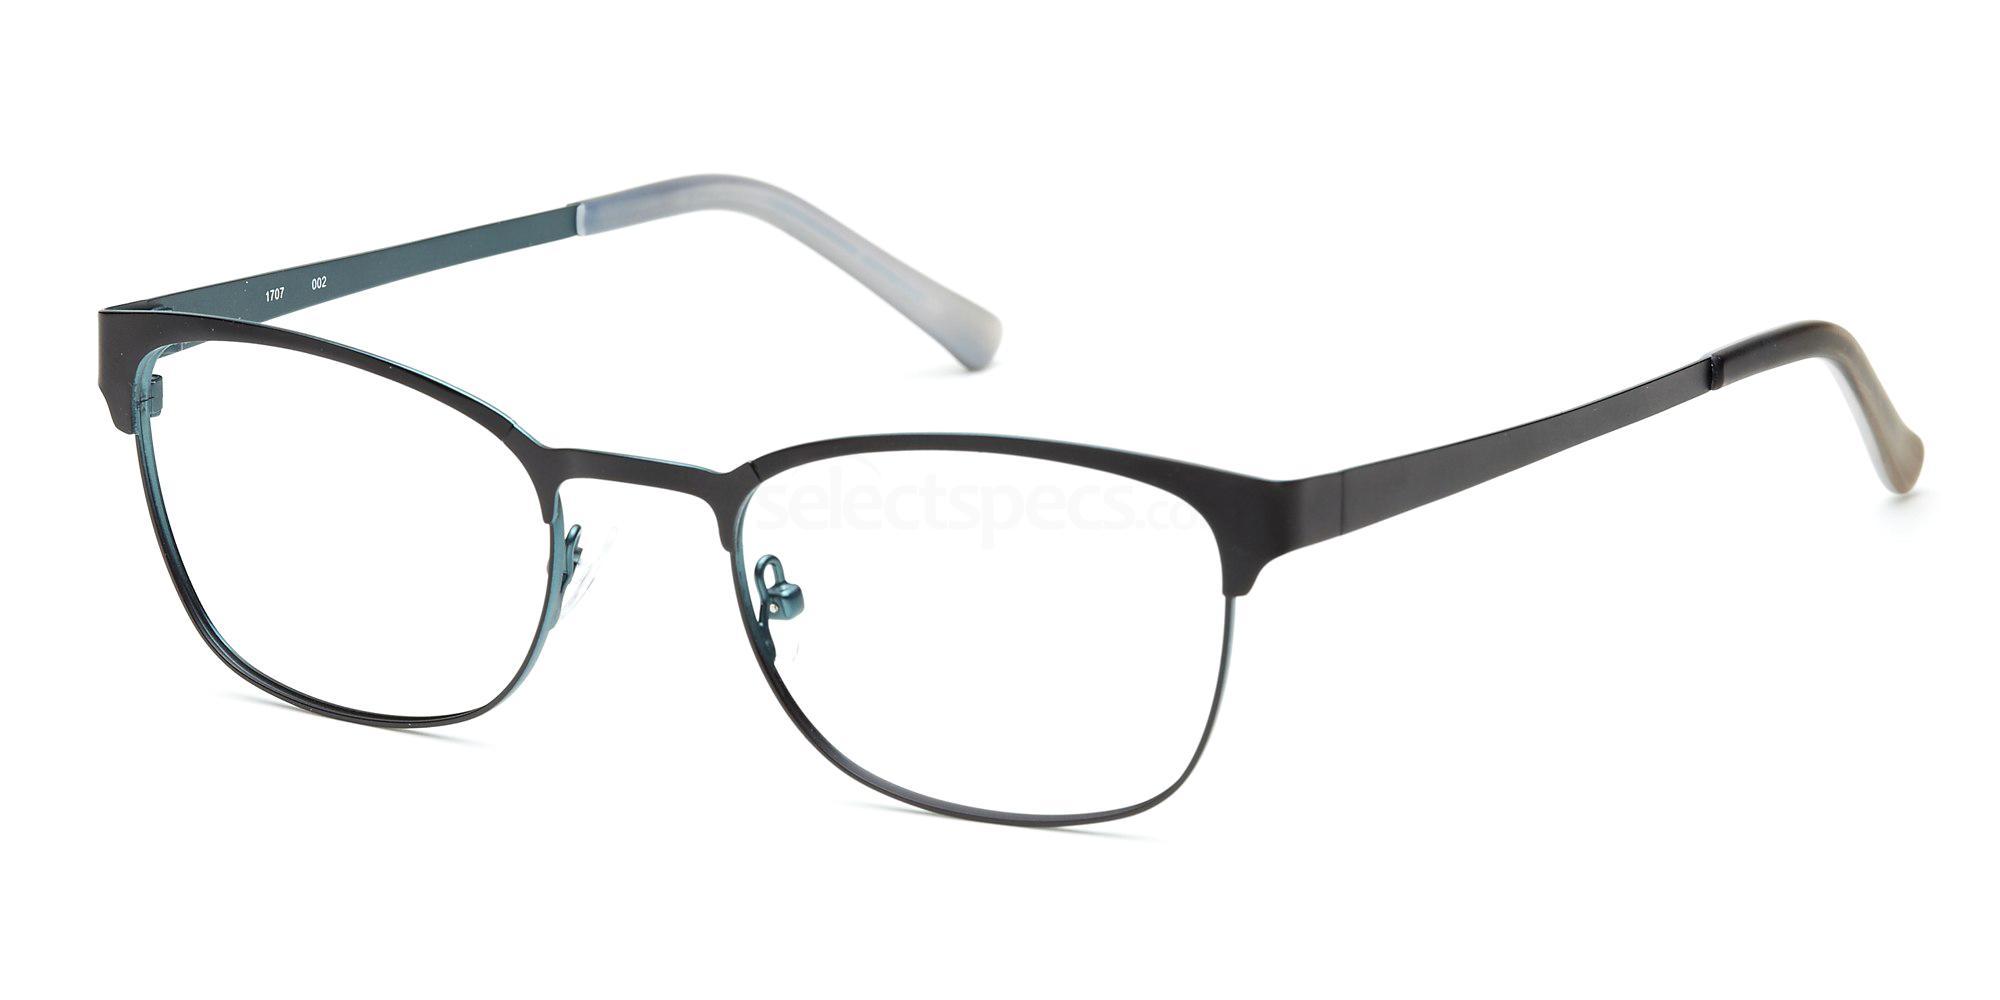 C1 FLX1707 Glasses, Flextra